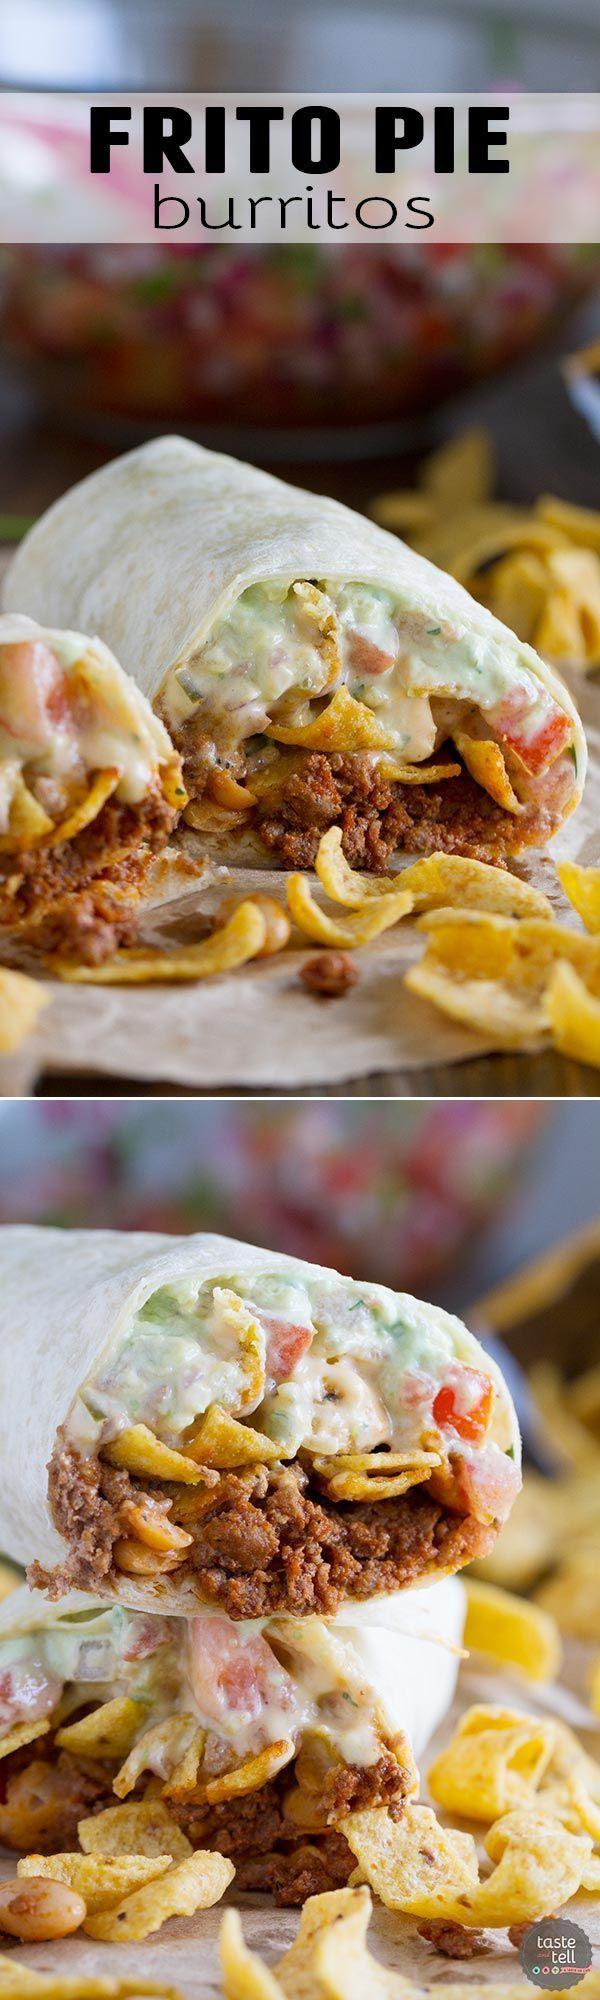 The ultimate Tex-Mex burrito - this Frito Pie Burrito is filled with chili, green chile queso, pico de gallo, avocado cream and jalapeños, all wrapped up in a tortilla.